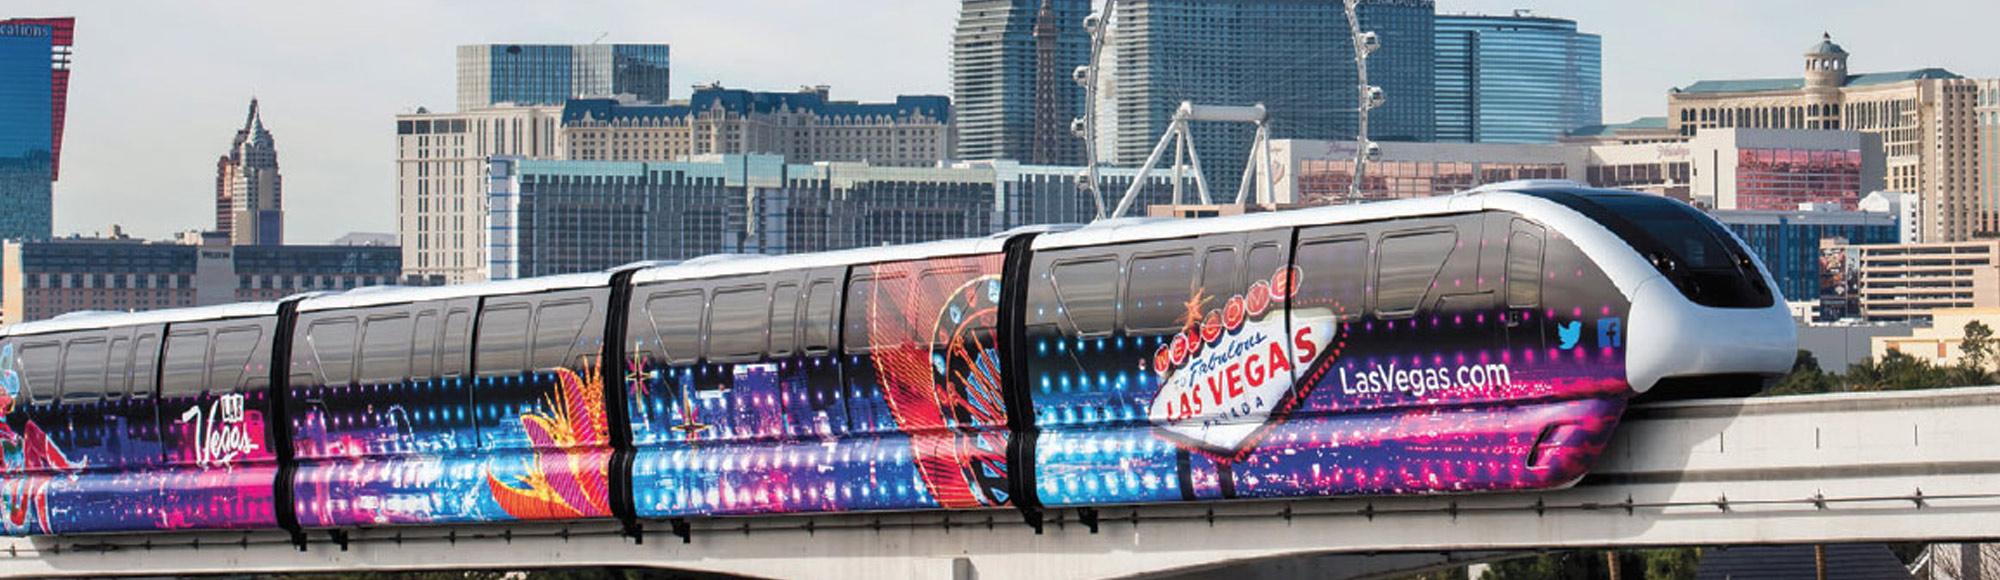 Las Vegas Monorail attraction